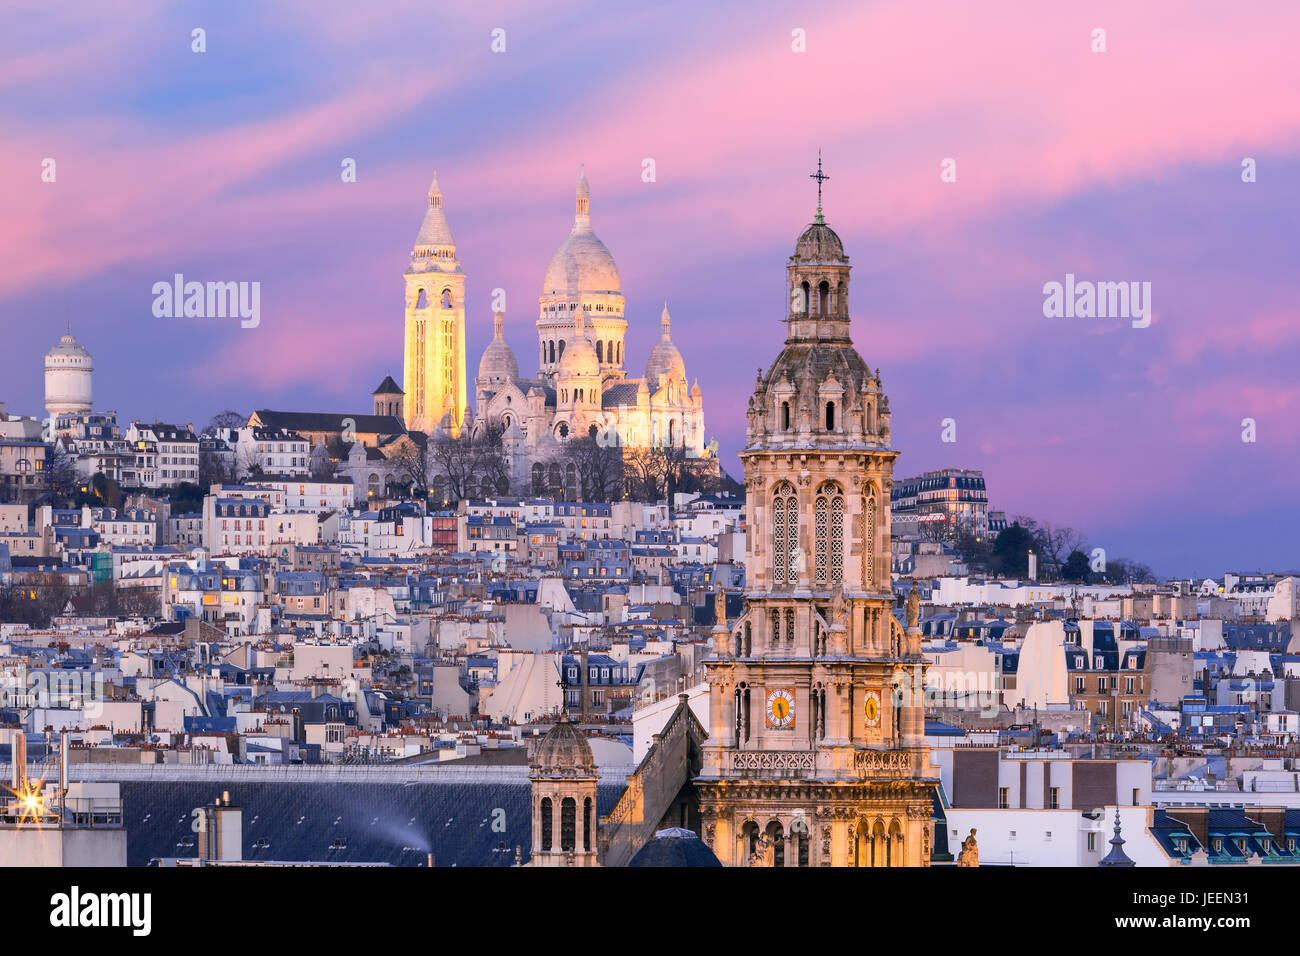 Sacre-Coeur Basilica at sunset in Paris, France - Stock Image